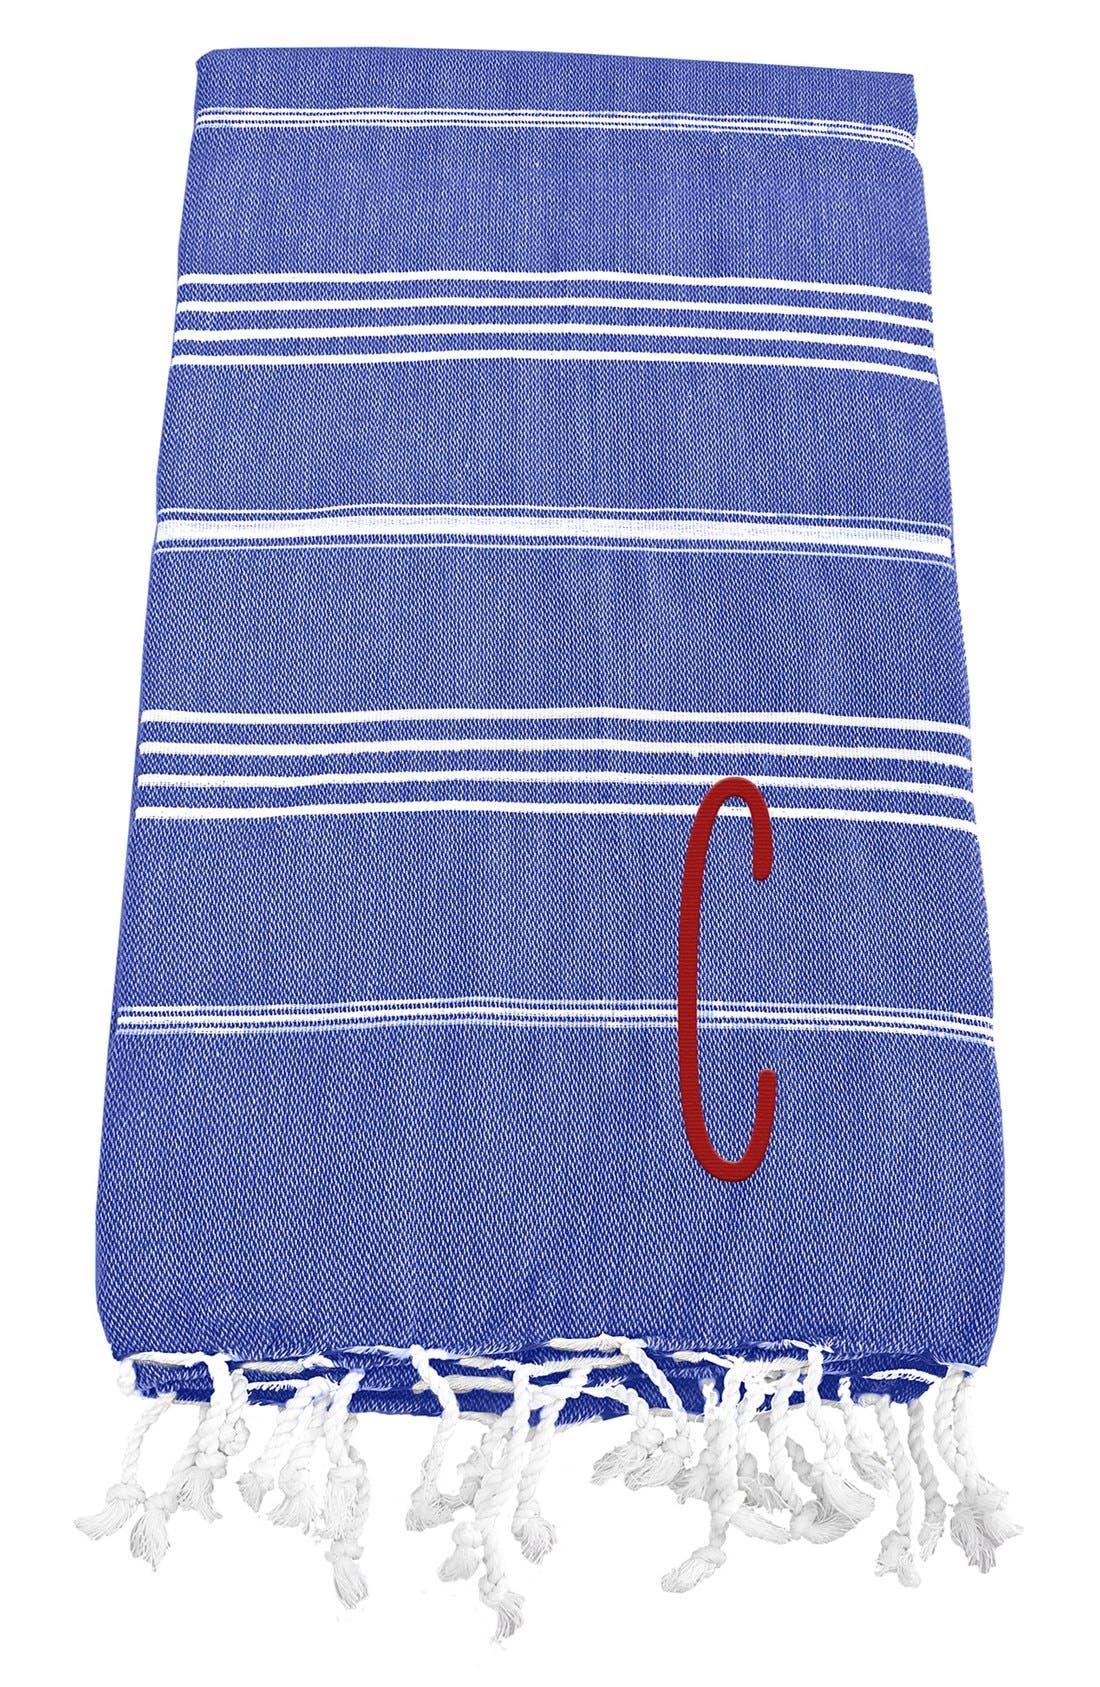 Monogram Turkish Cotton Towel,                             Main thumbnail 59, color,